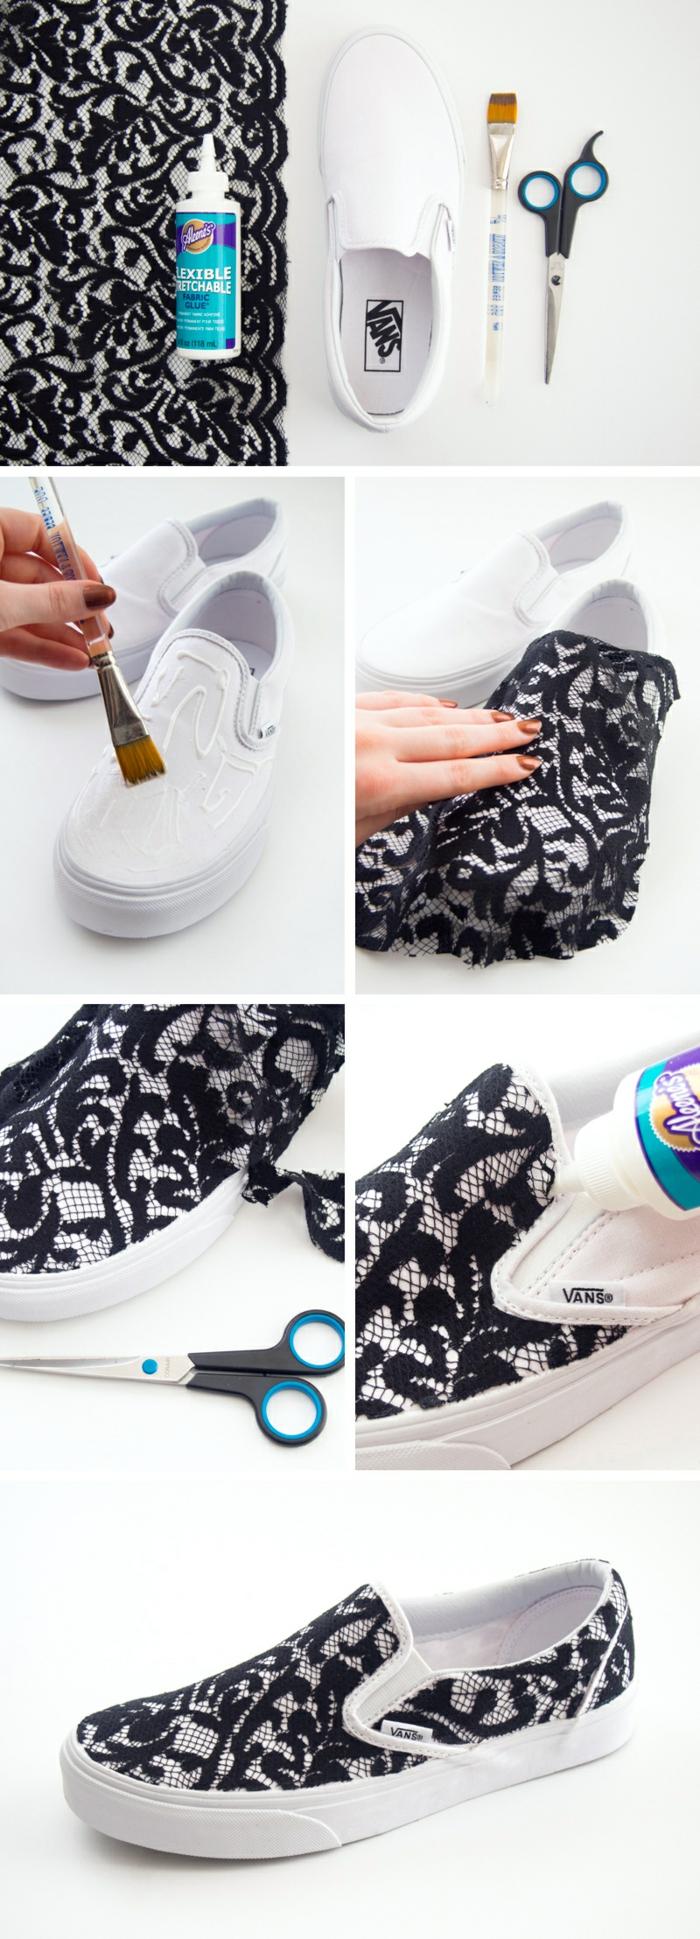 transformer vos chaussures- décoration tendance